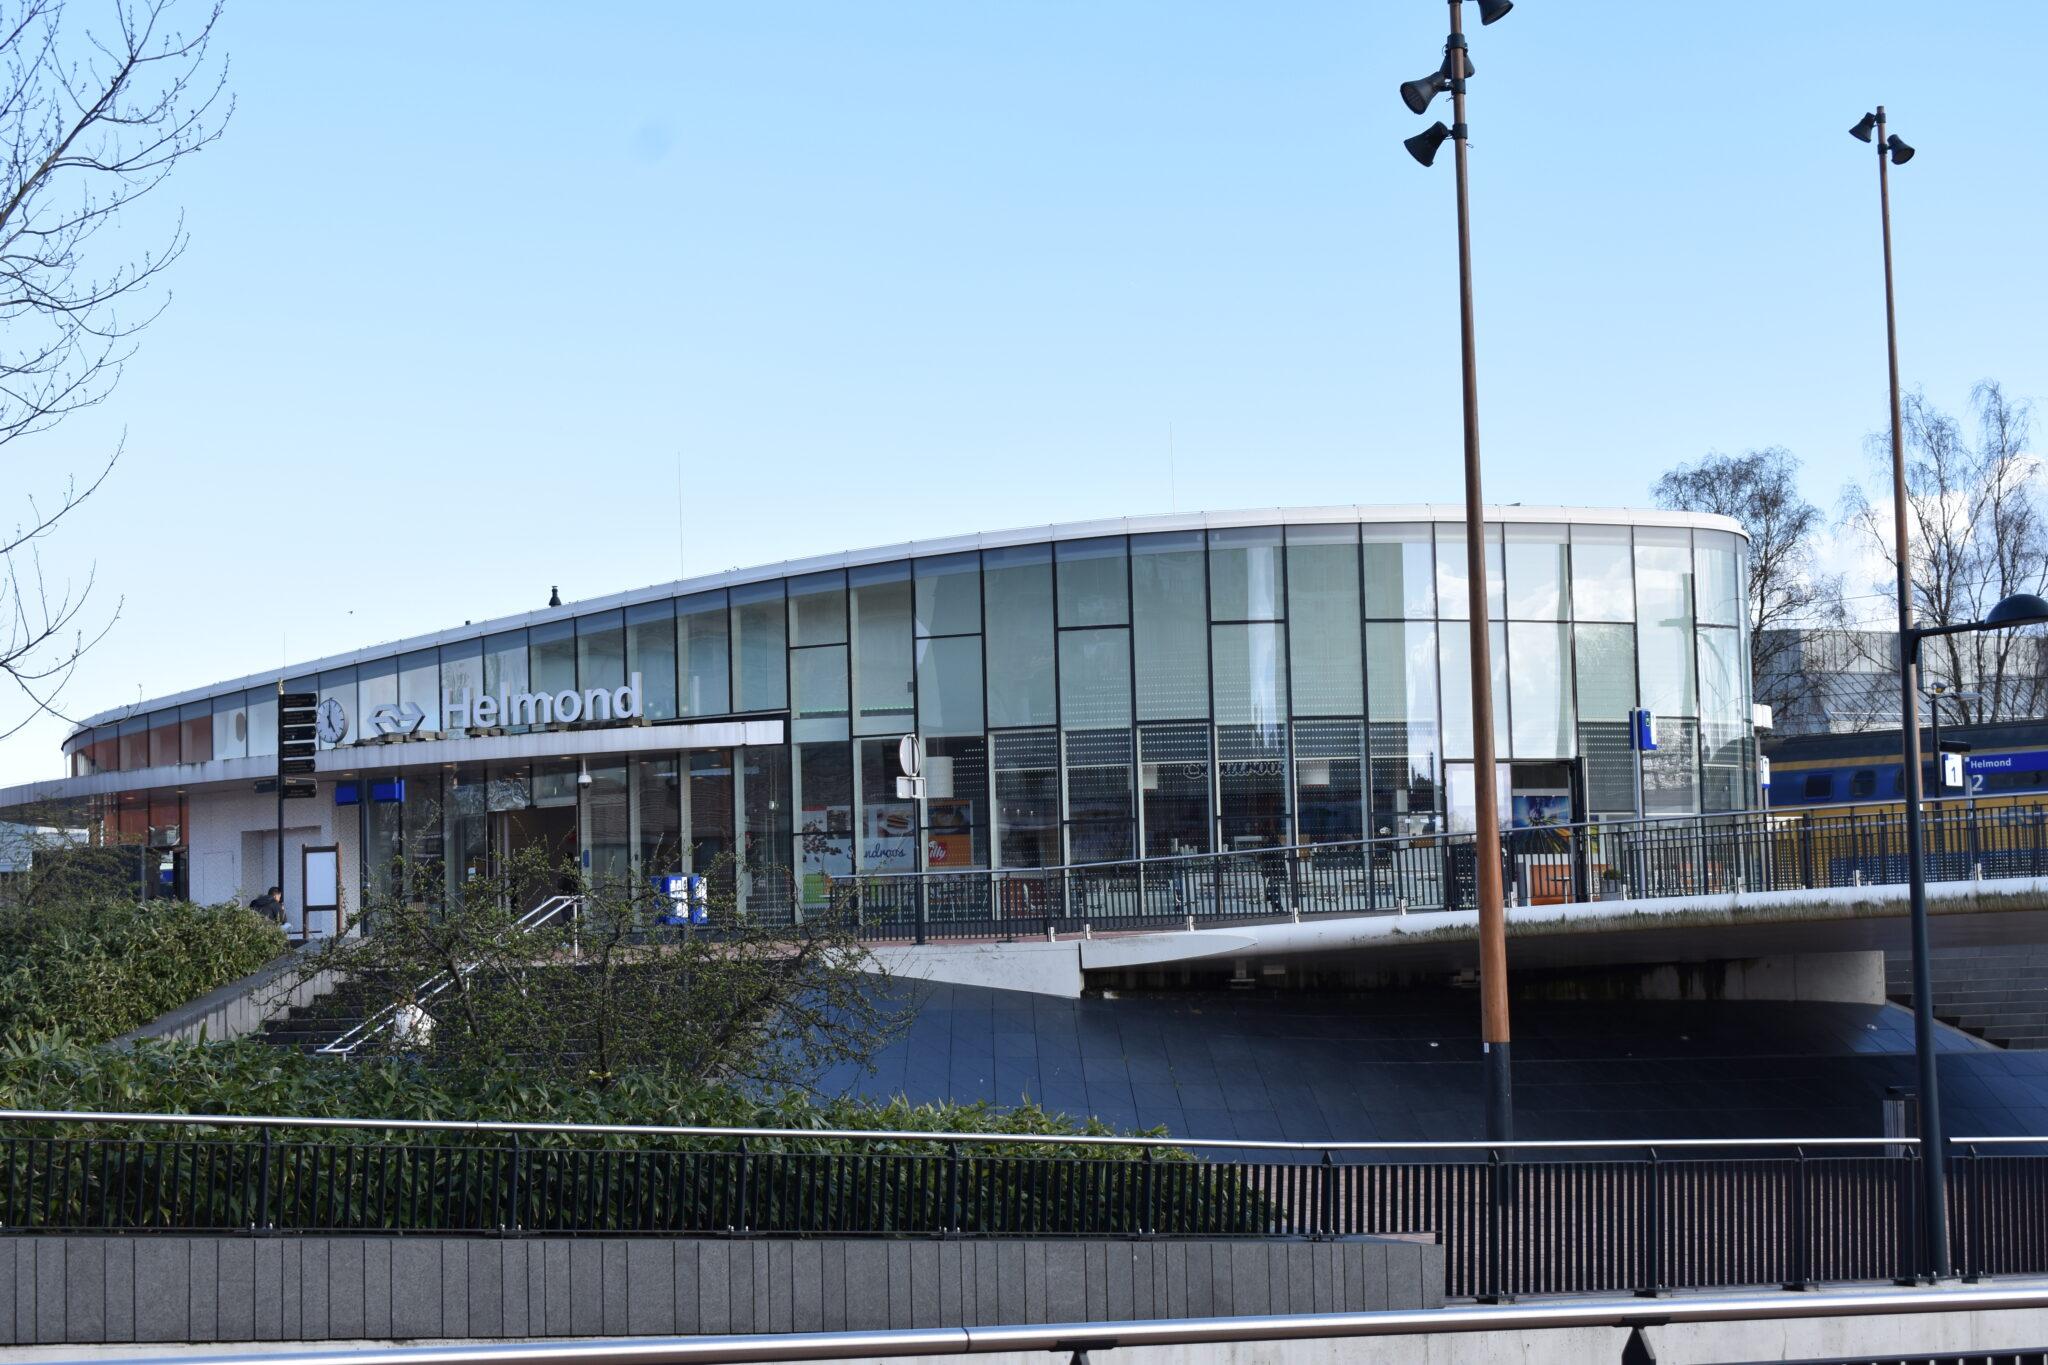 Station Helmond centraal